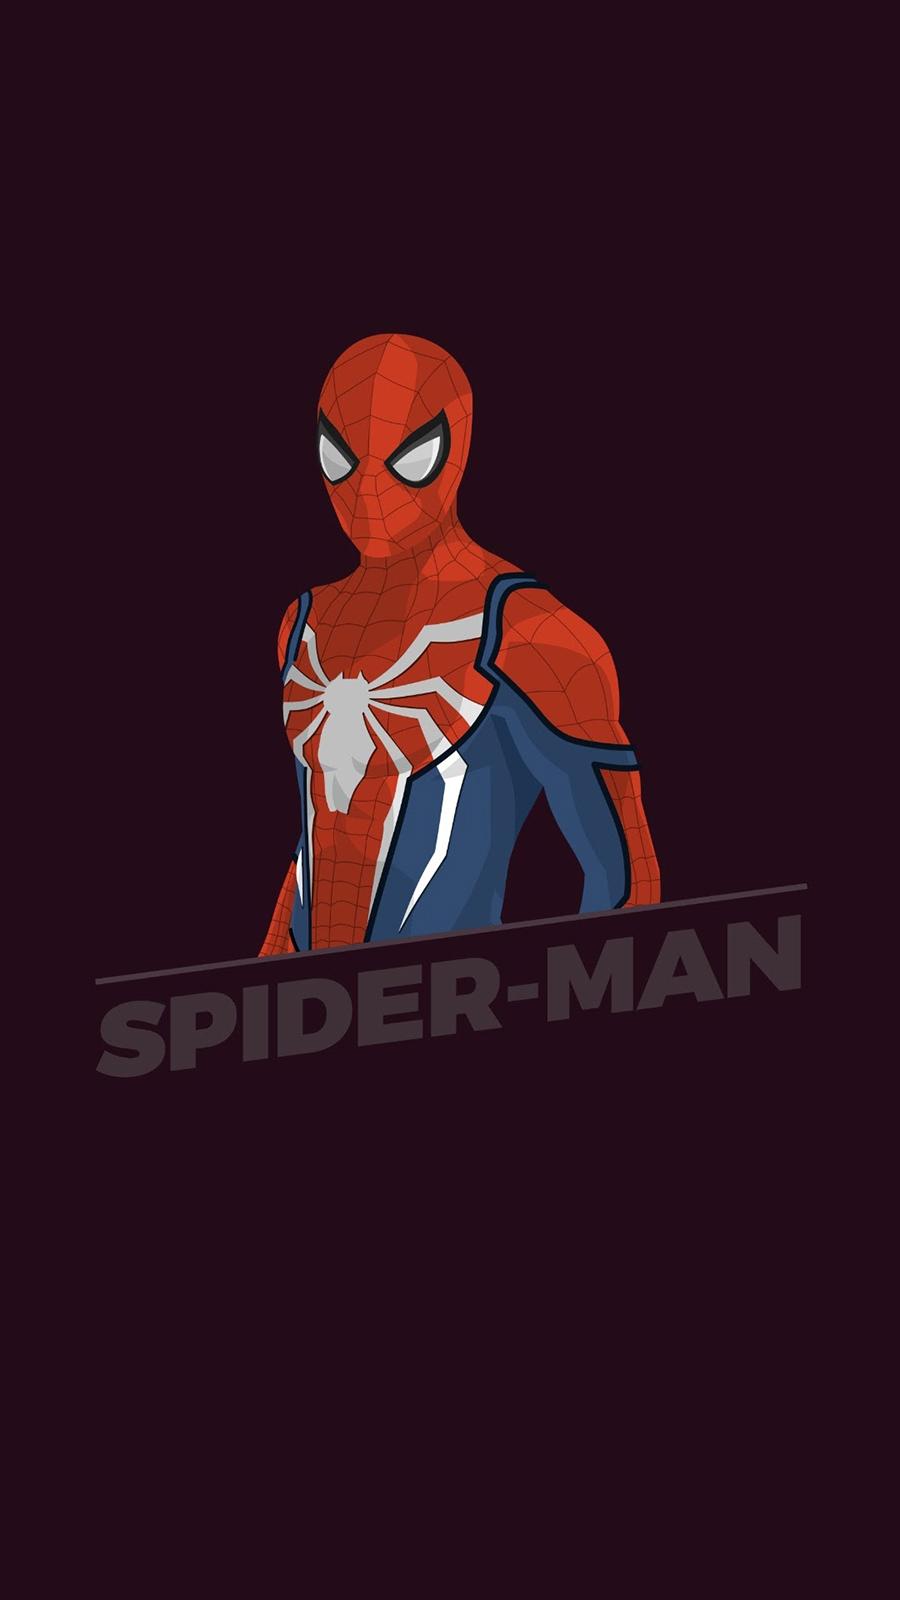 SPIDER MAN HD Wallpapers Free Download for Phone & Desktop (1)